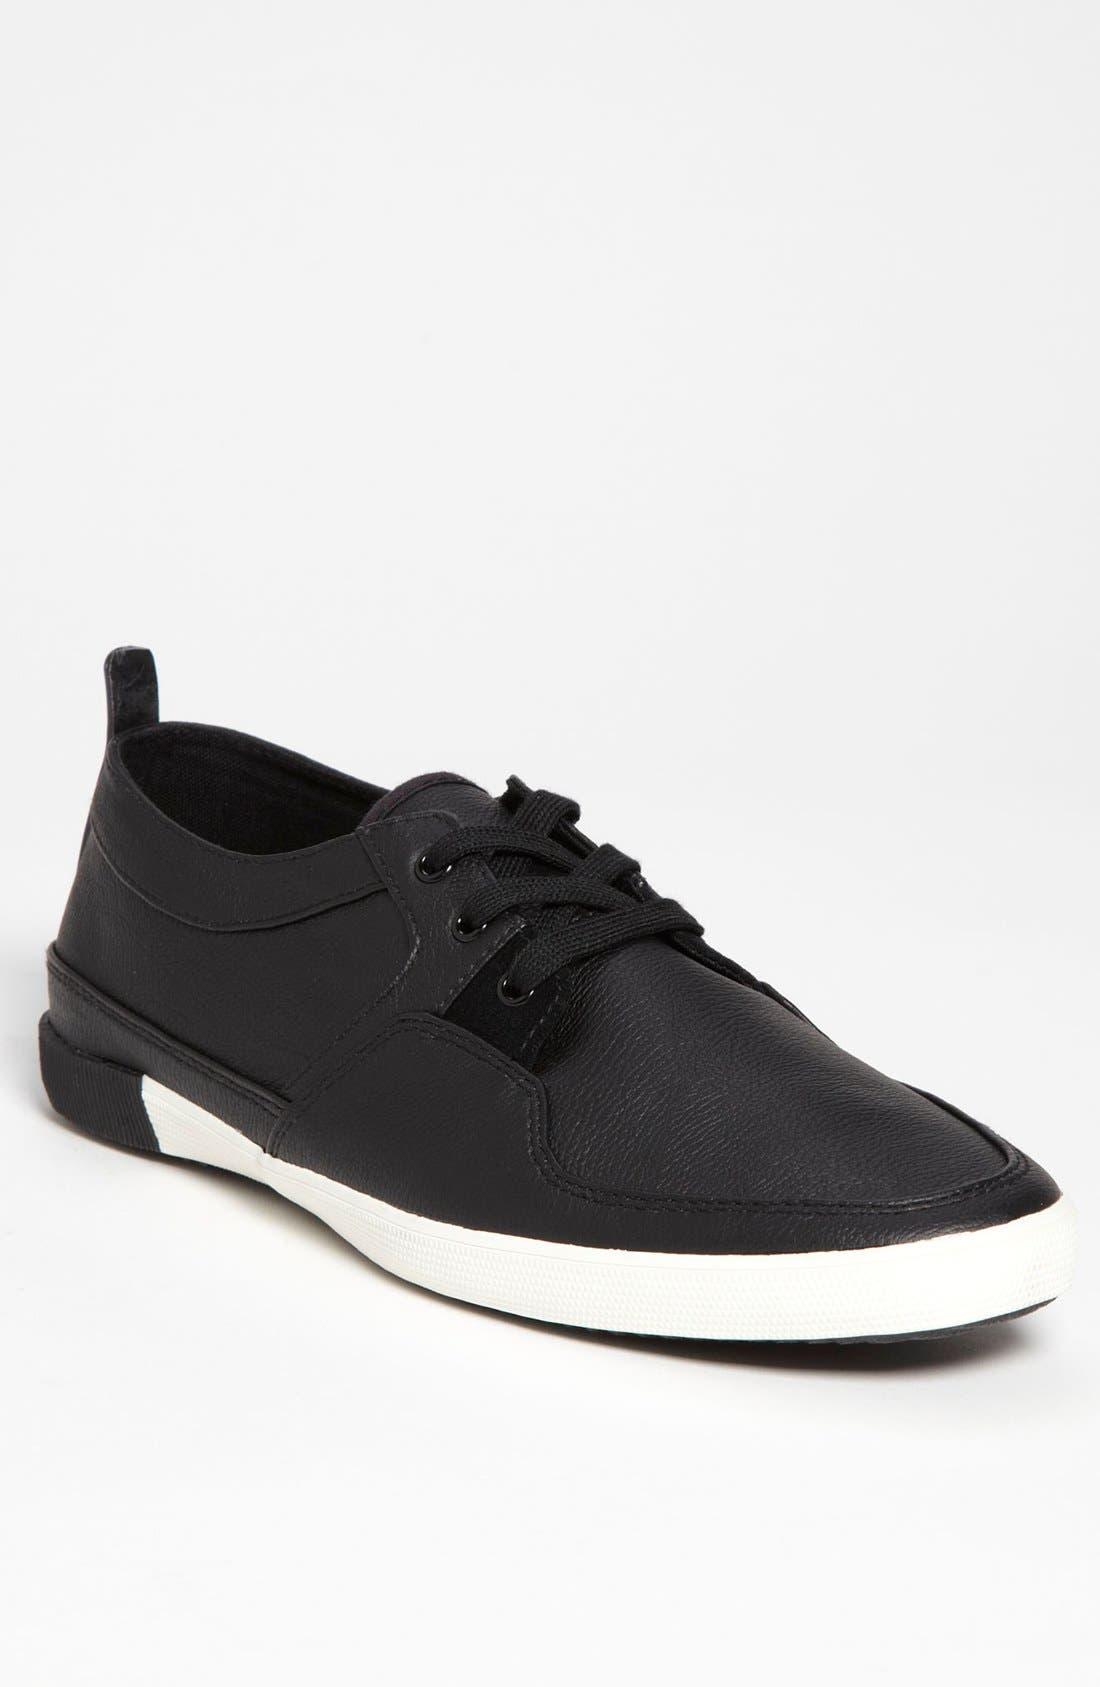 Alternate Image 1 Selected - ALDO 'Brunderman' Sneaker